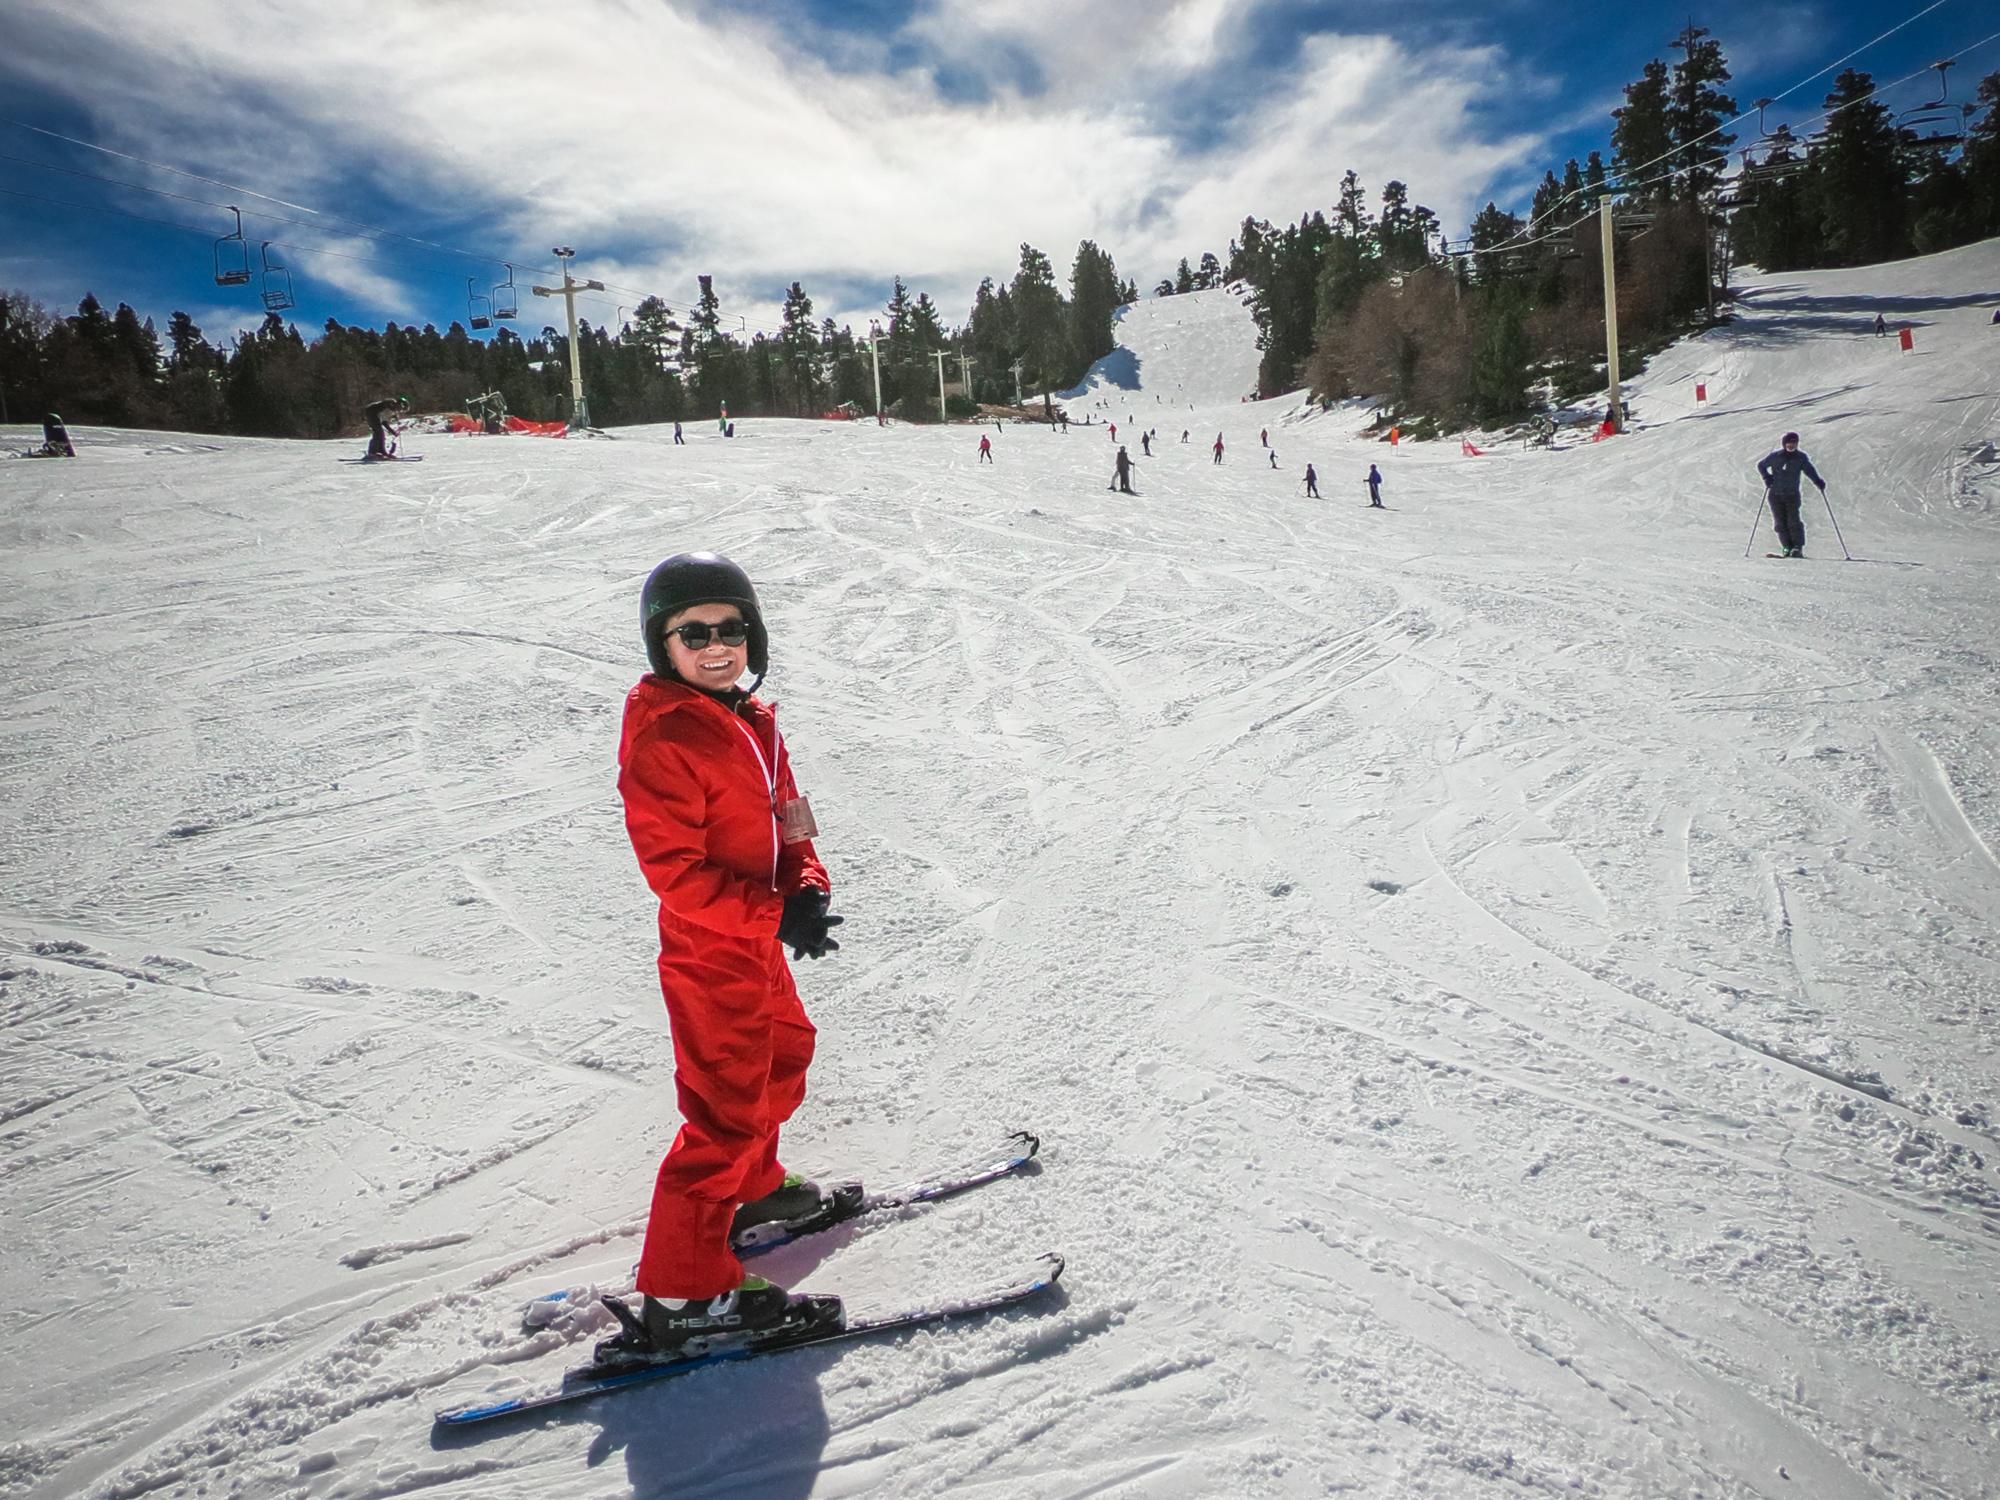 Big_bear_lake_snow_summit-3.JPG